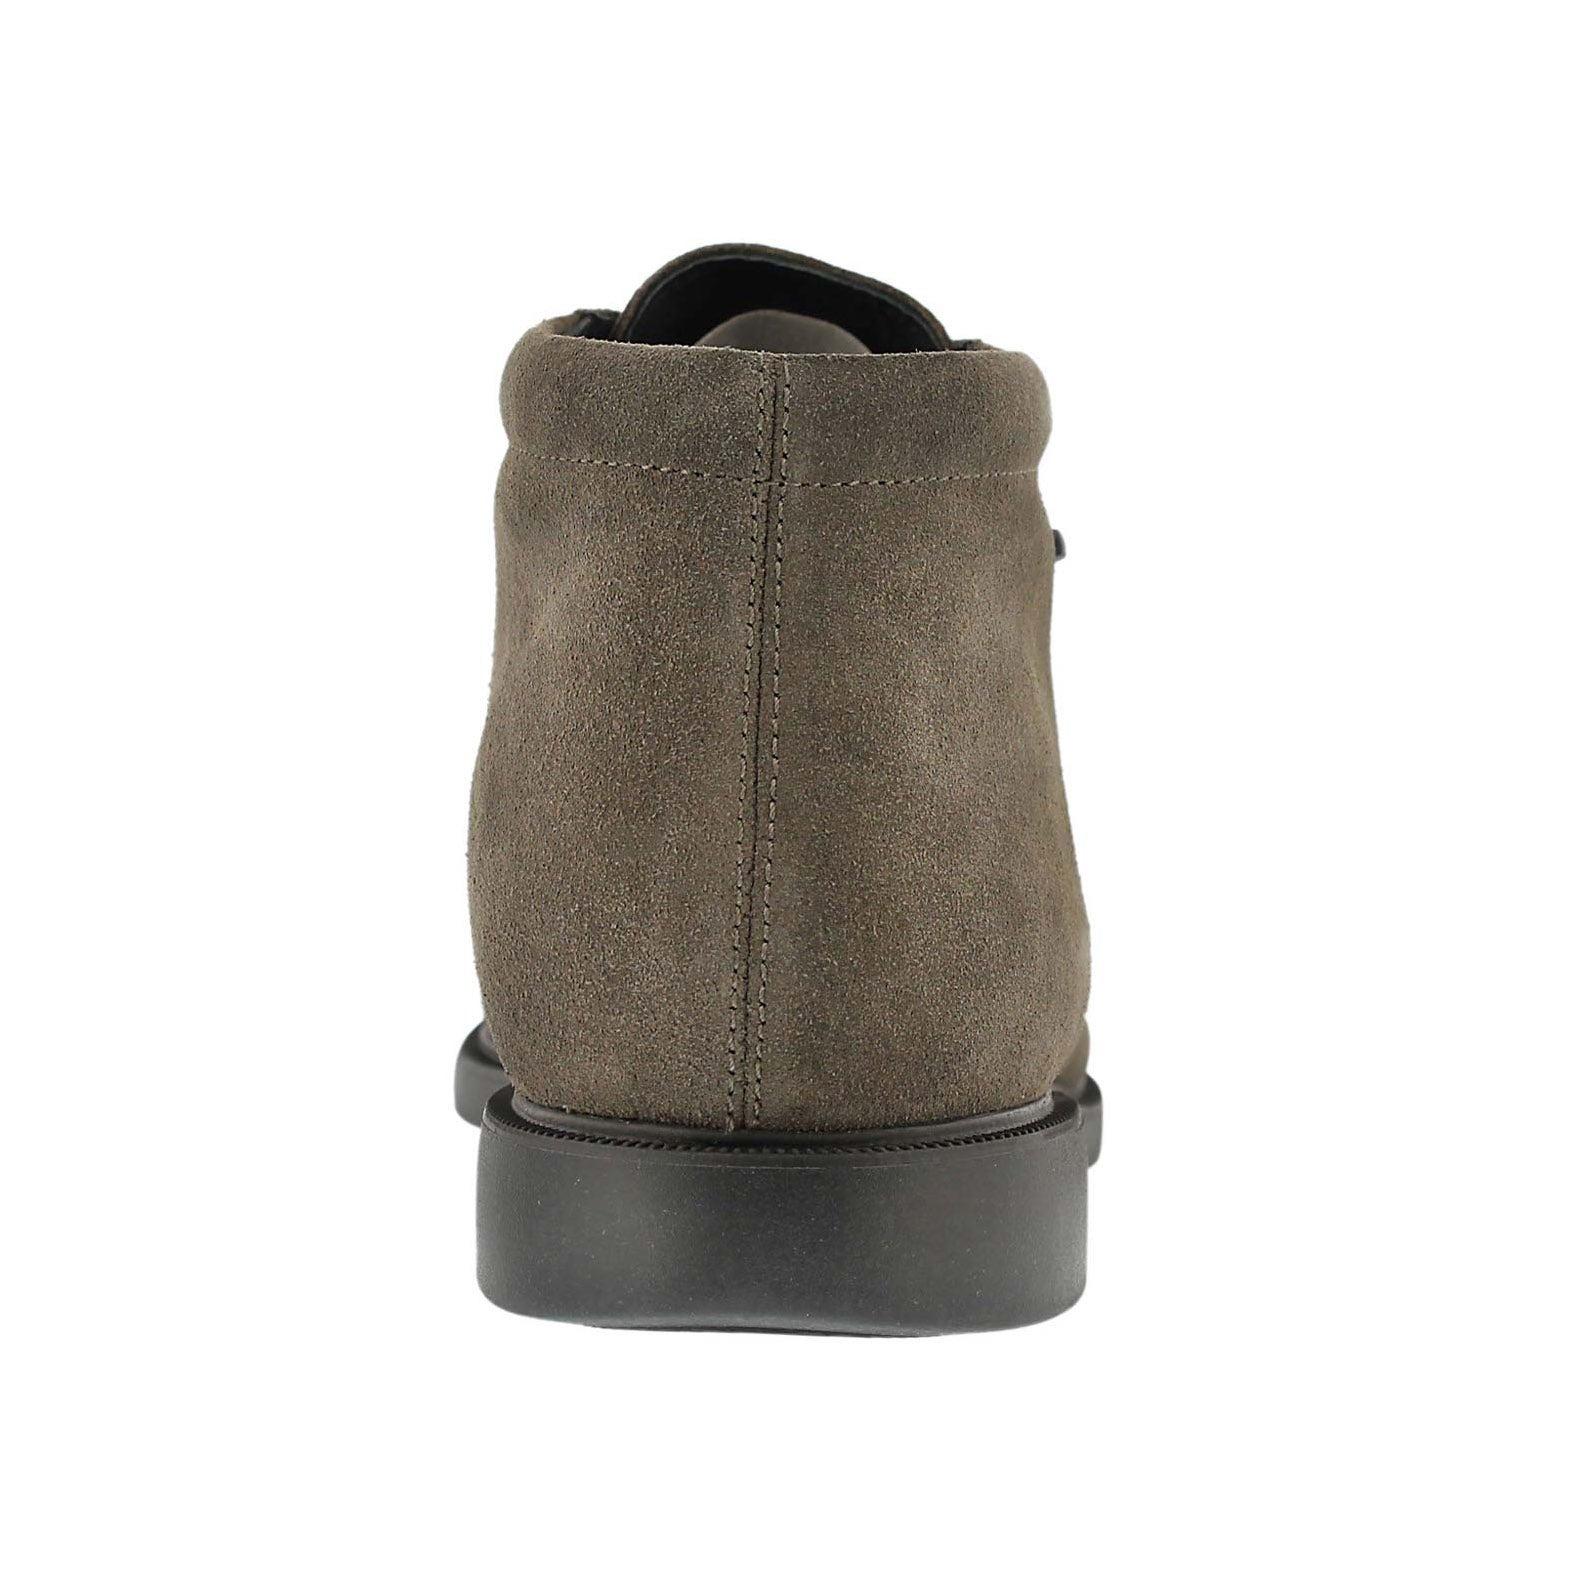 Mns Brayden 2Fit ABX desert chukka boot